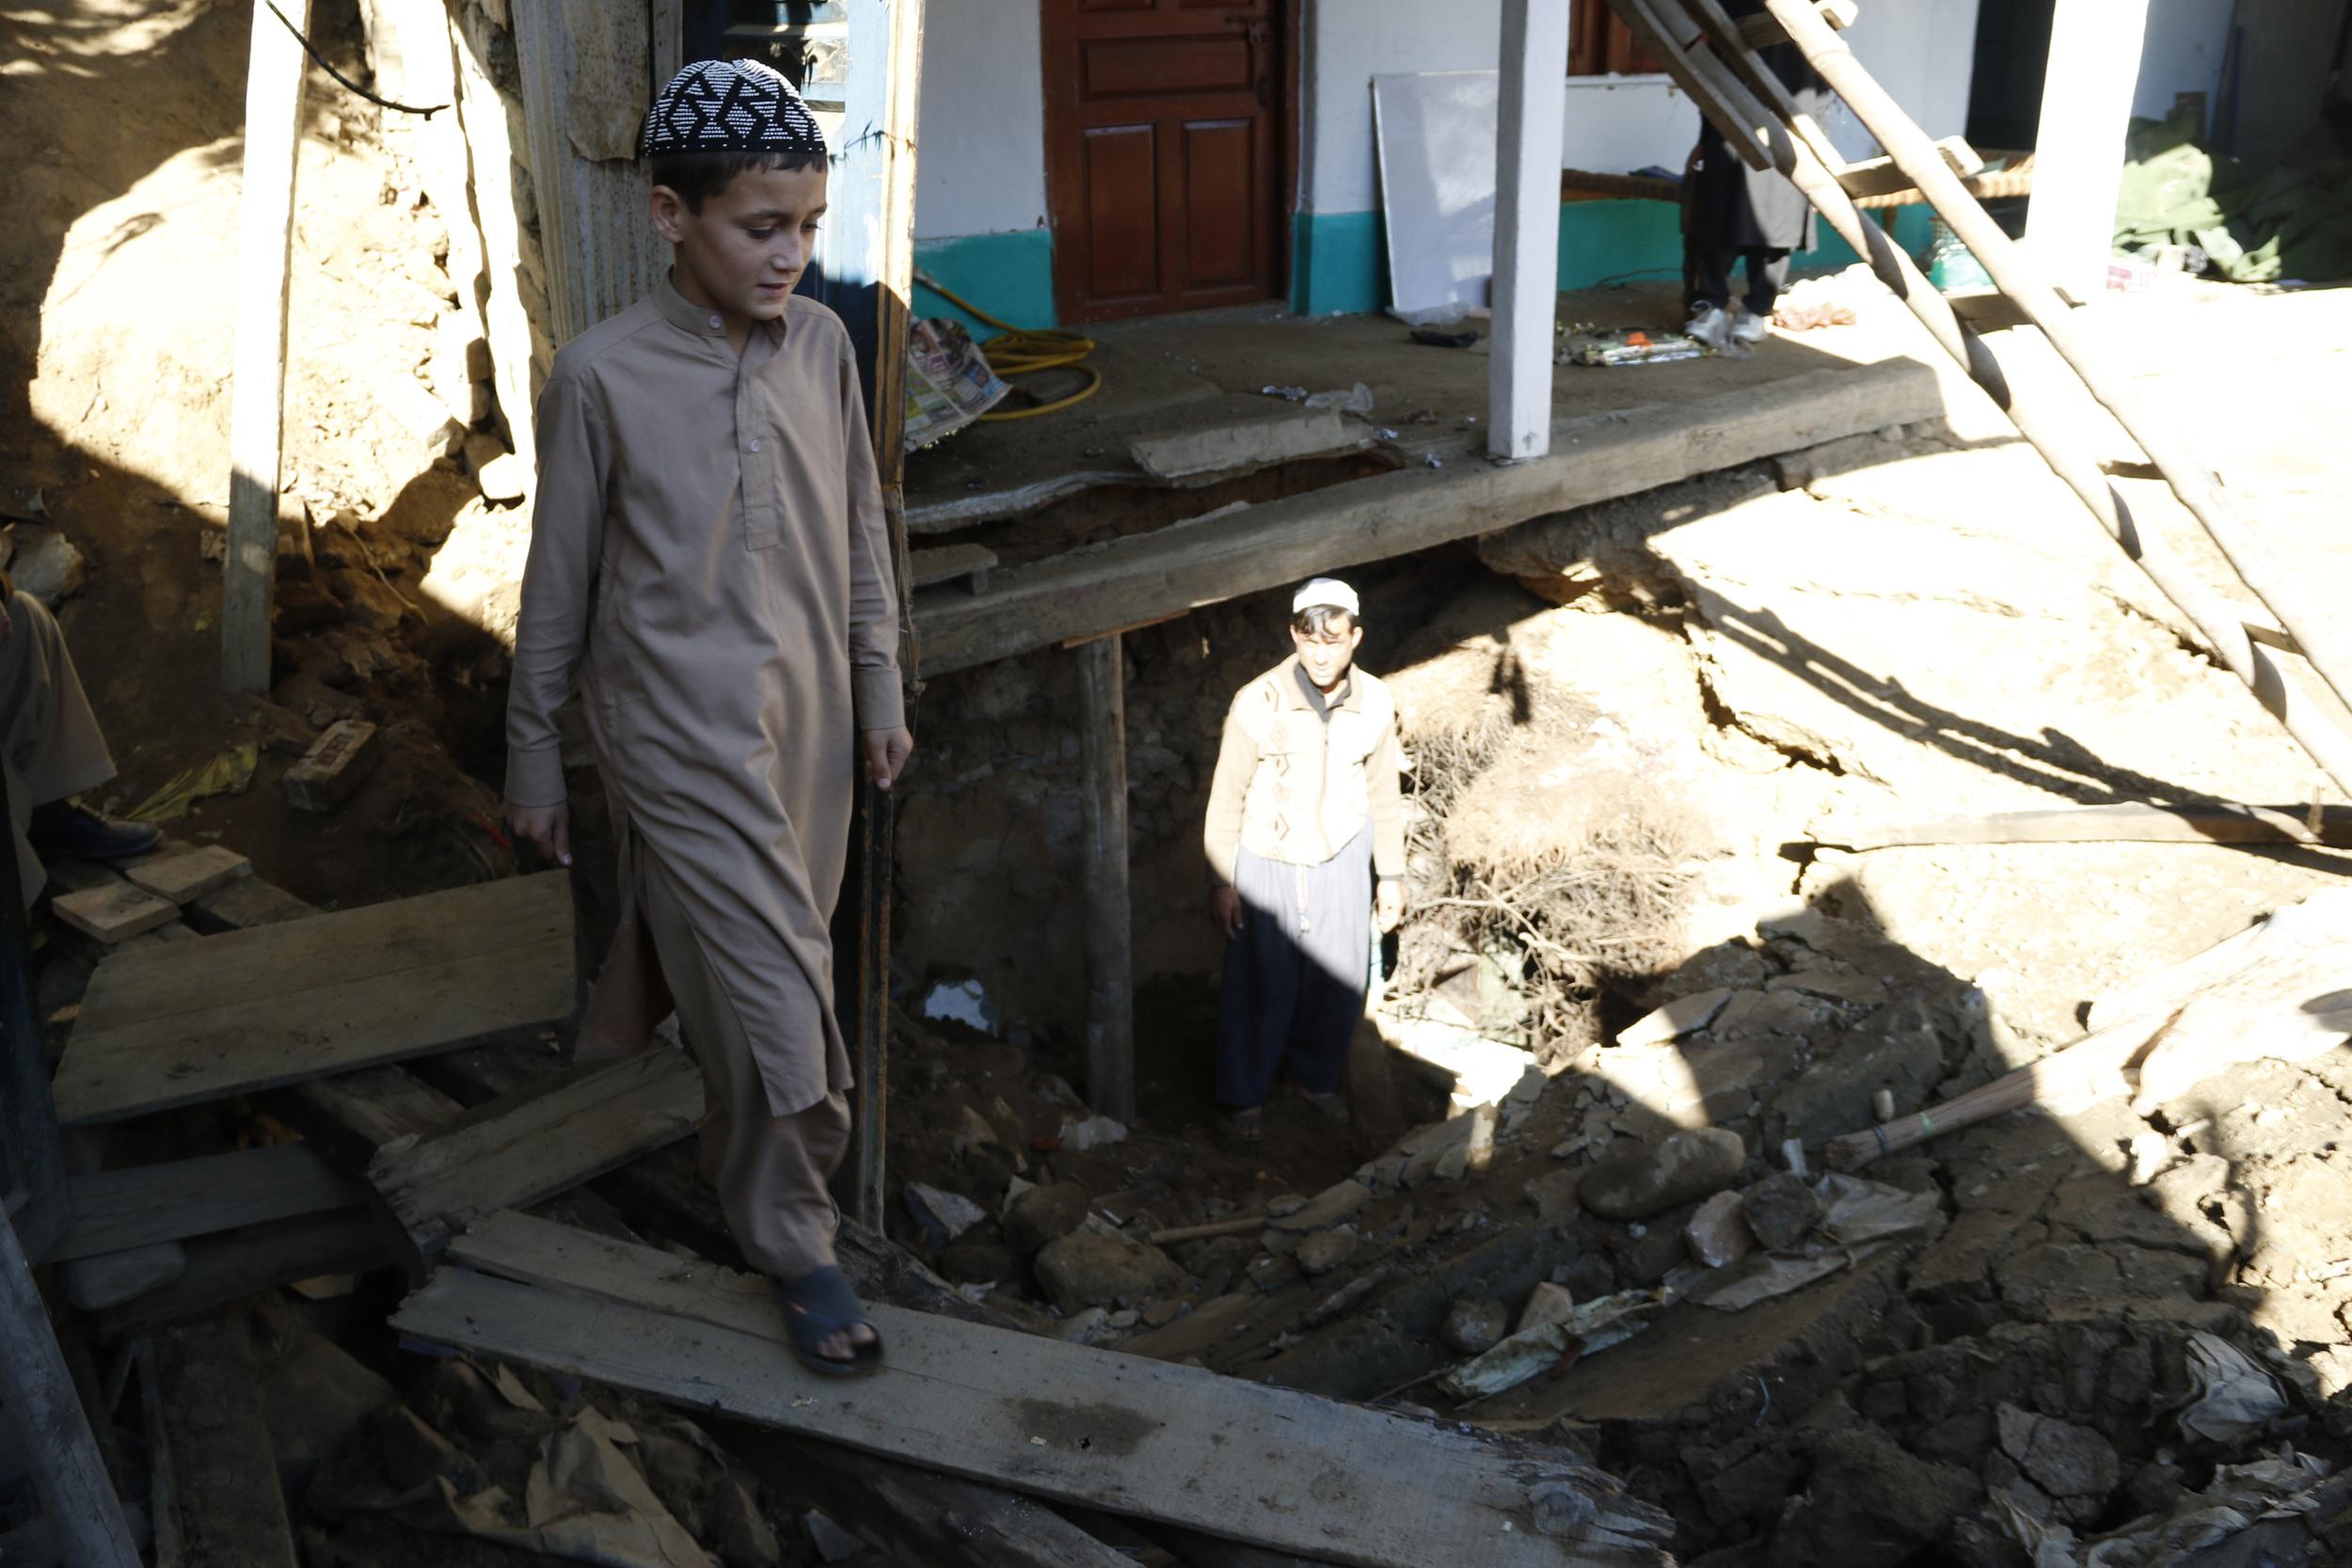 KPK Pak Earthquake Damage 2.JPG